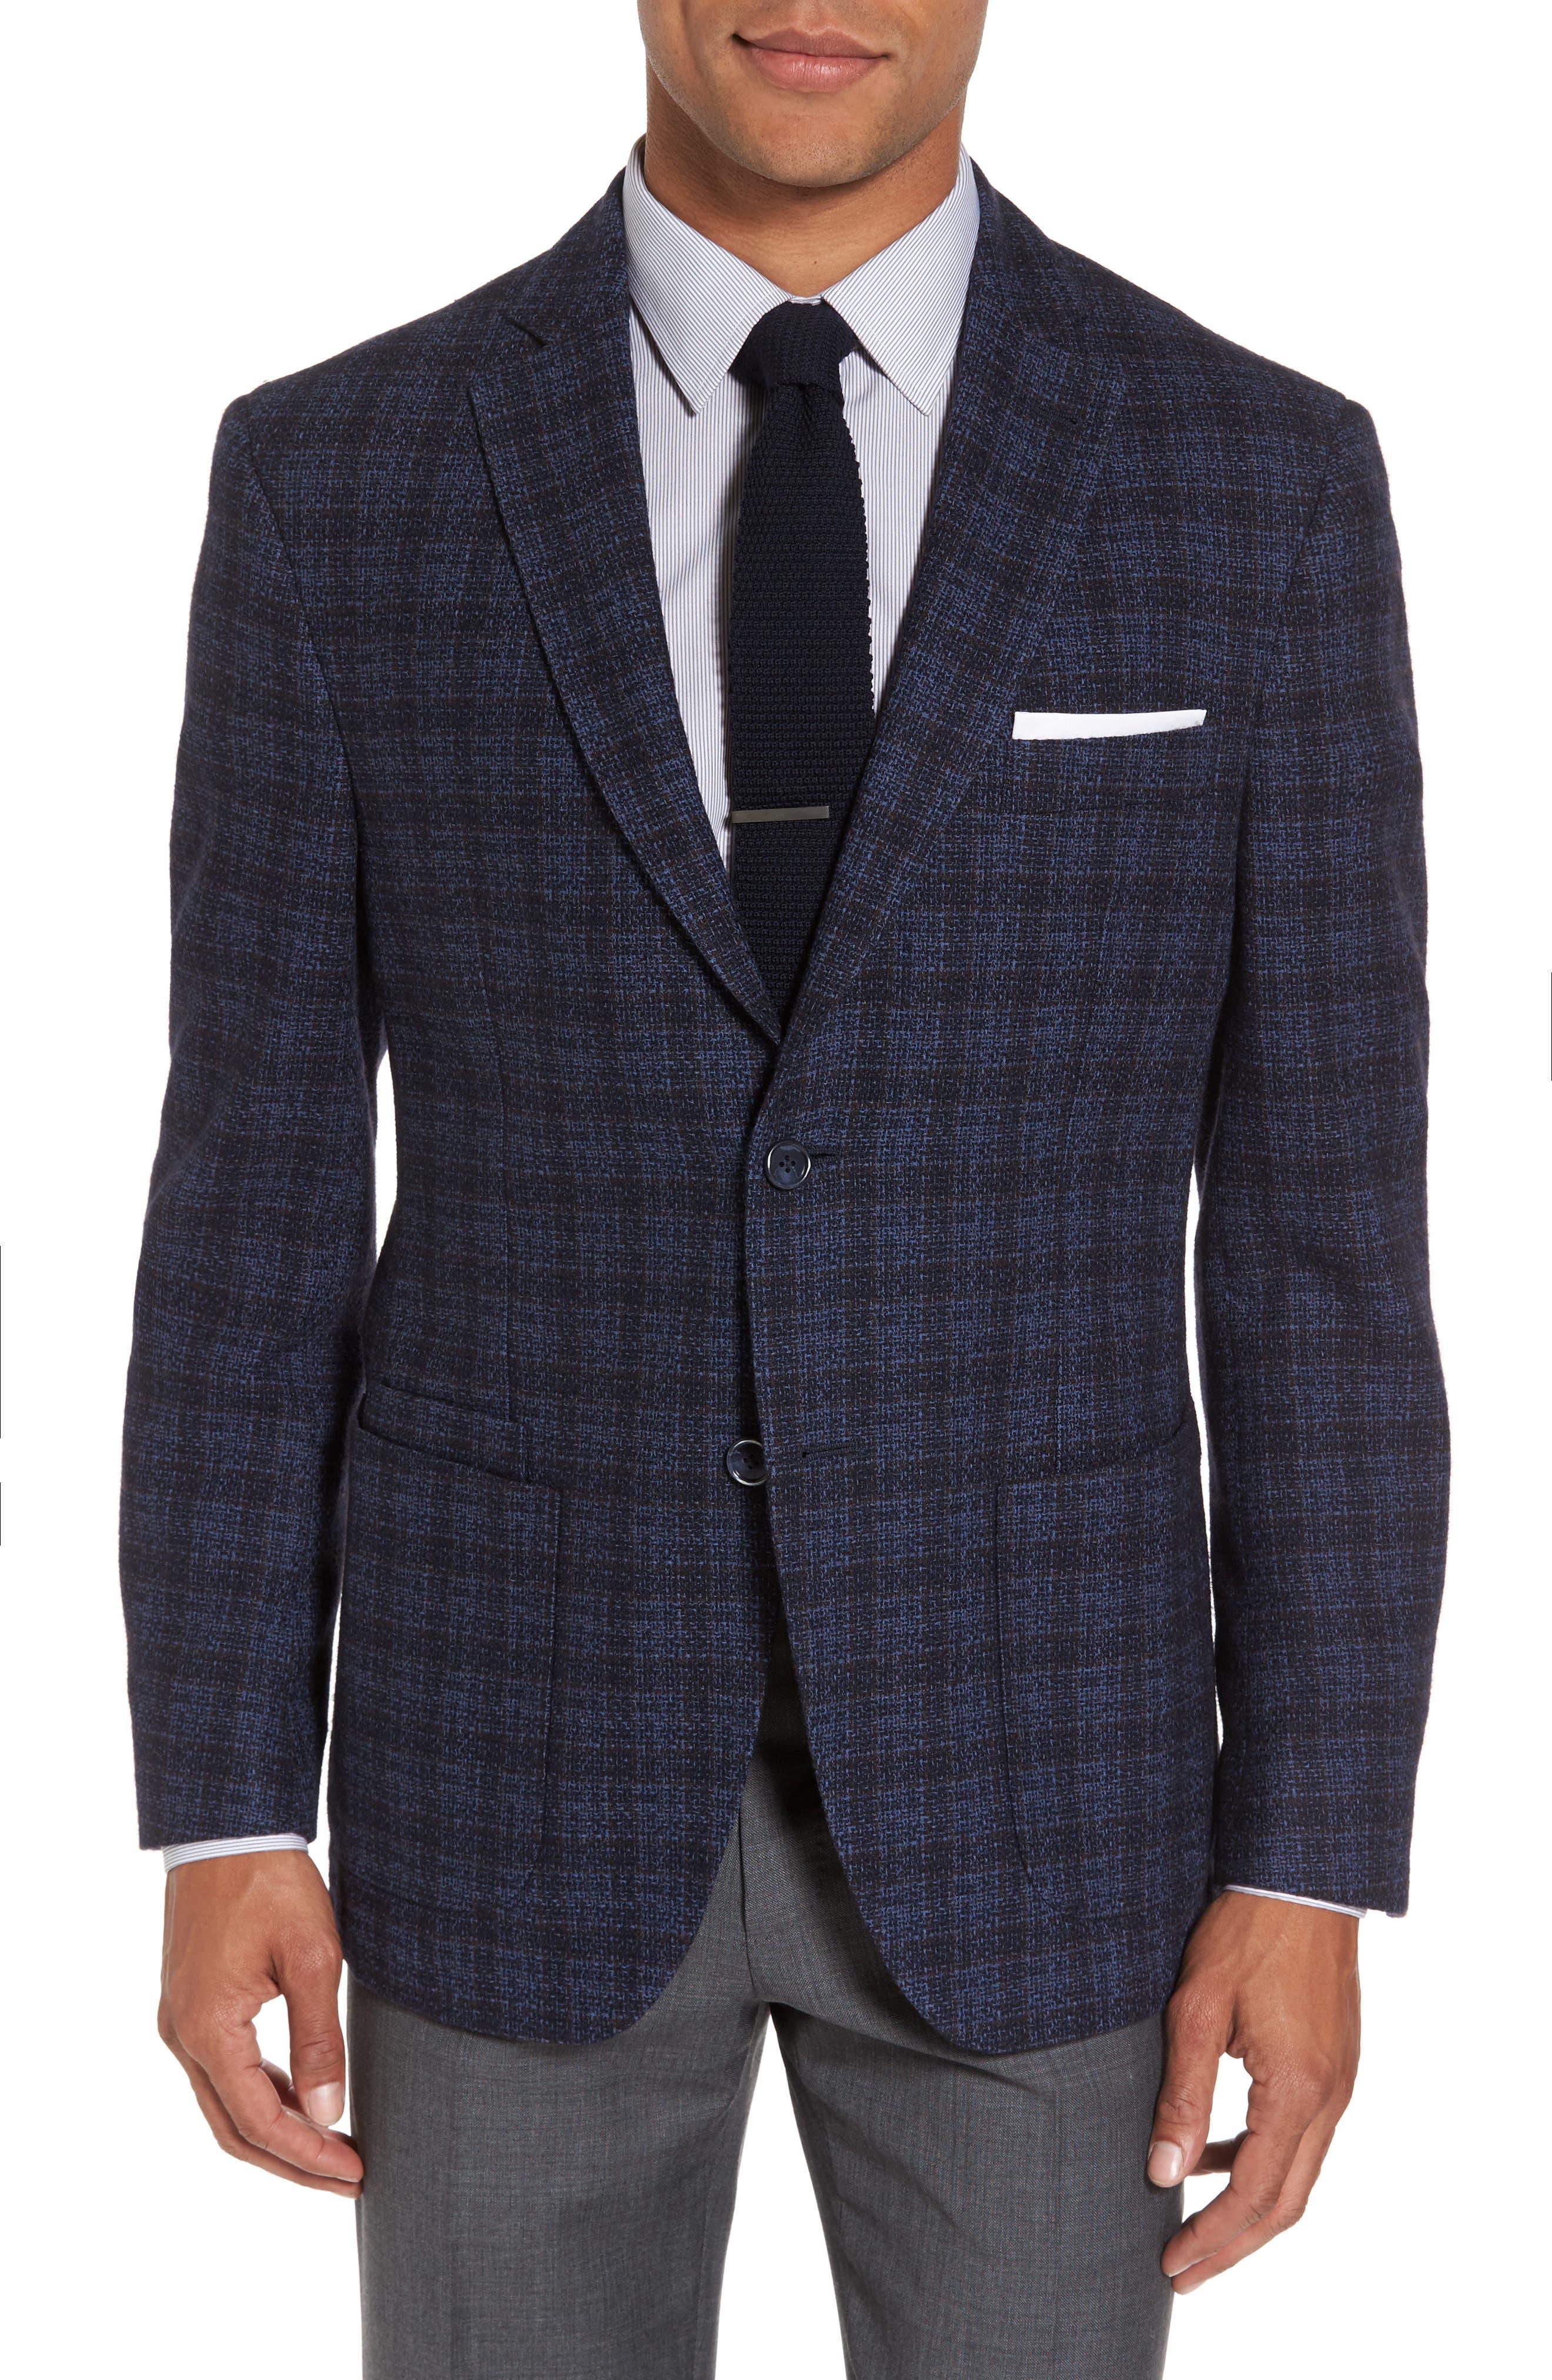 Alternate Image 1 Selected - JKT New York Trim Fit Plaid Cotton Blend Sport Coat